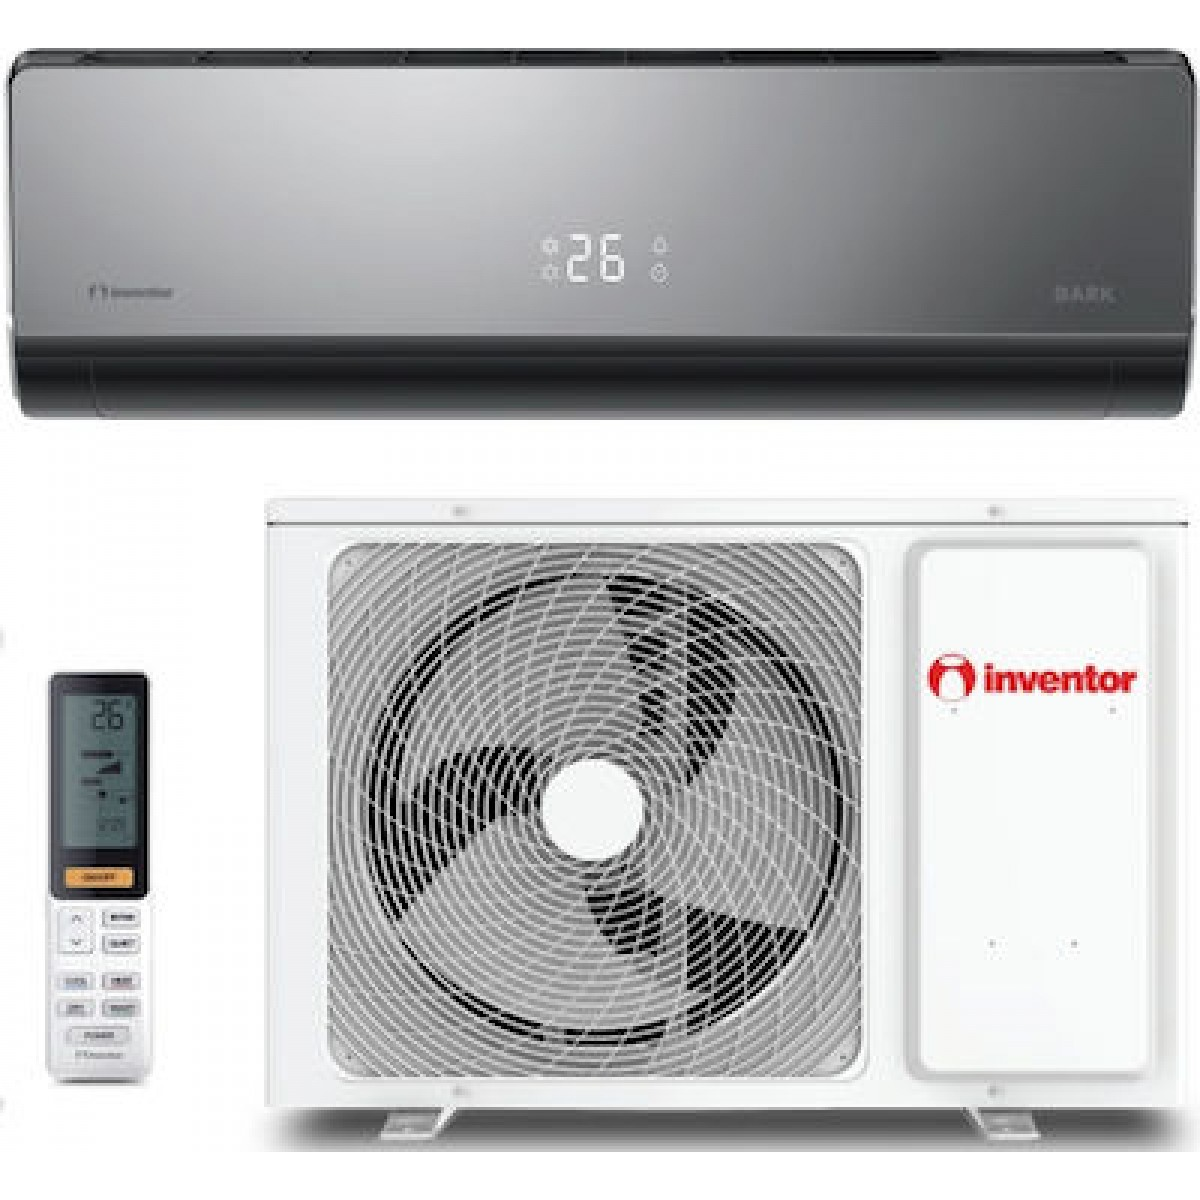 Inventor Dark DRVI32-09WF Θέρμανση, Κλιματισμός Ηλεκτρικες Συσκευες - homeelectrics.gr